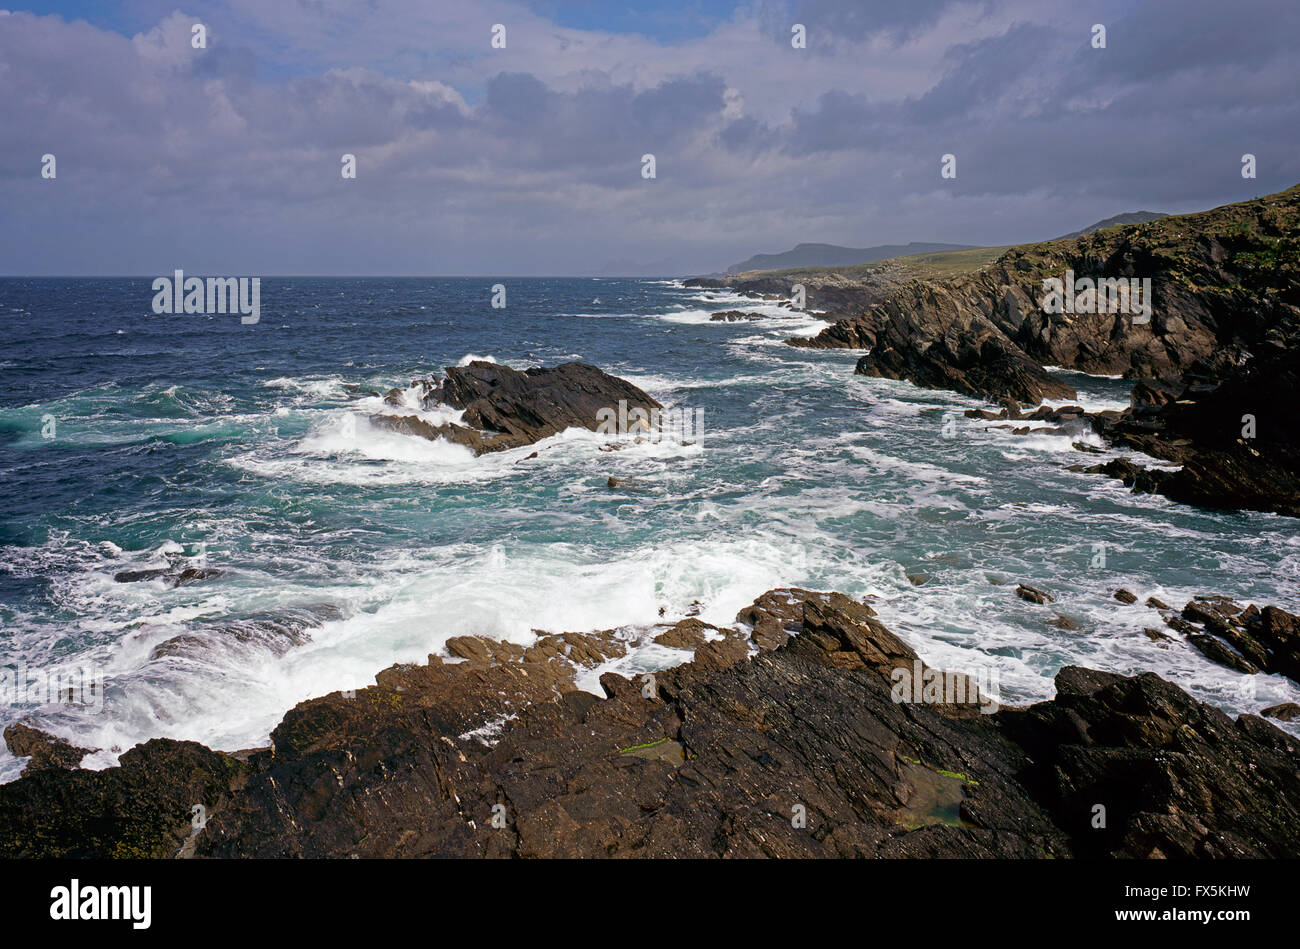 Atlantic seas of Achill Island, County Mayo, West Coast of Ireland Stock Photo